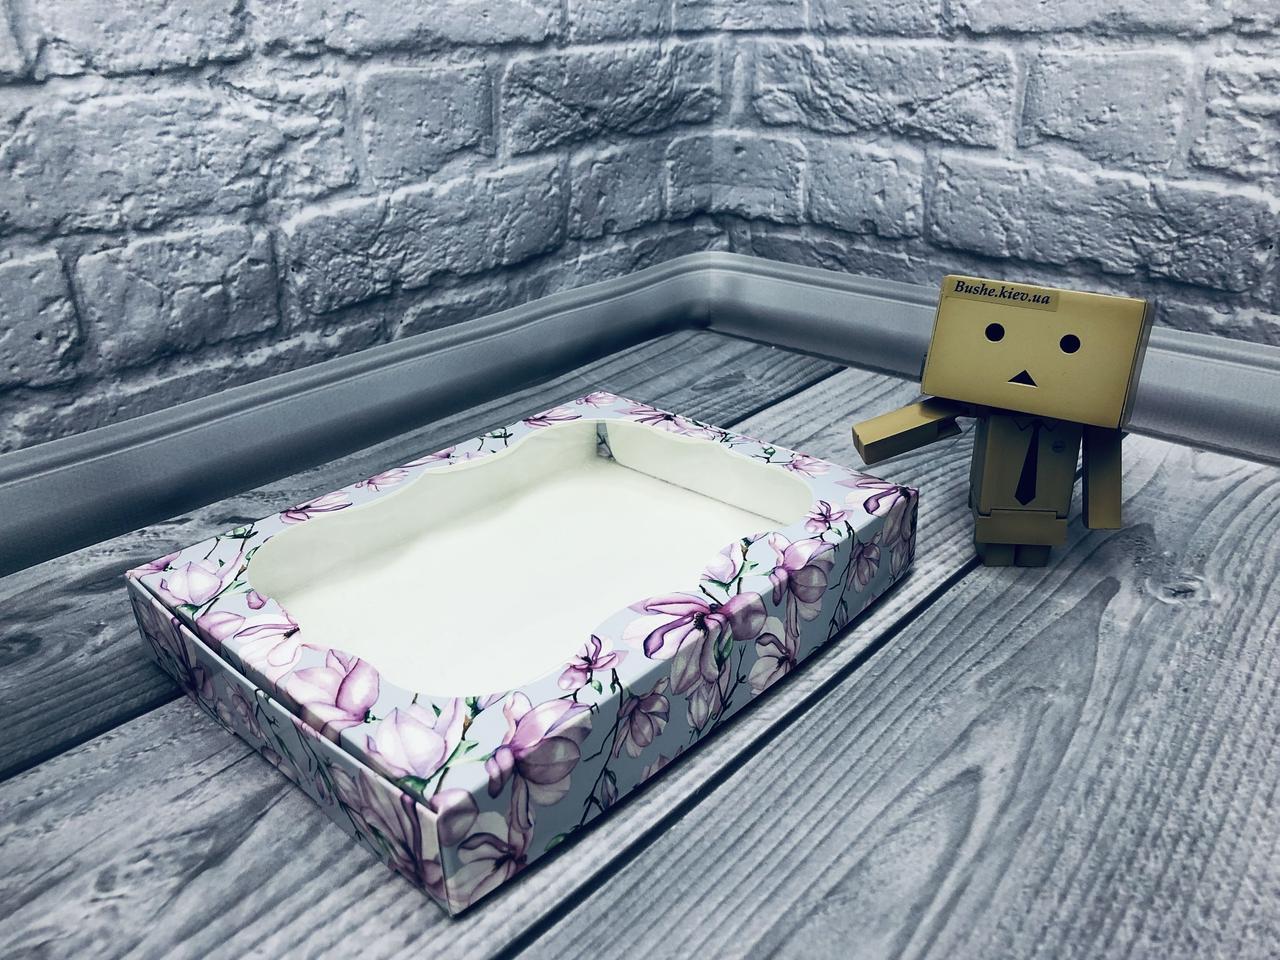 *10 шт* / Коробка для пряников / 150х200х30 мм / печать-Магнол / окно-обычн / лк / цв